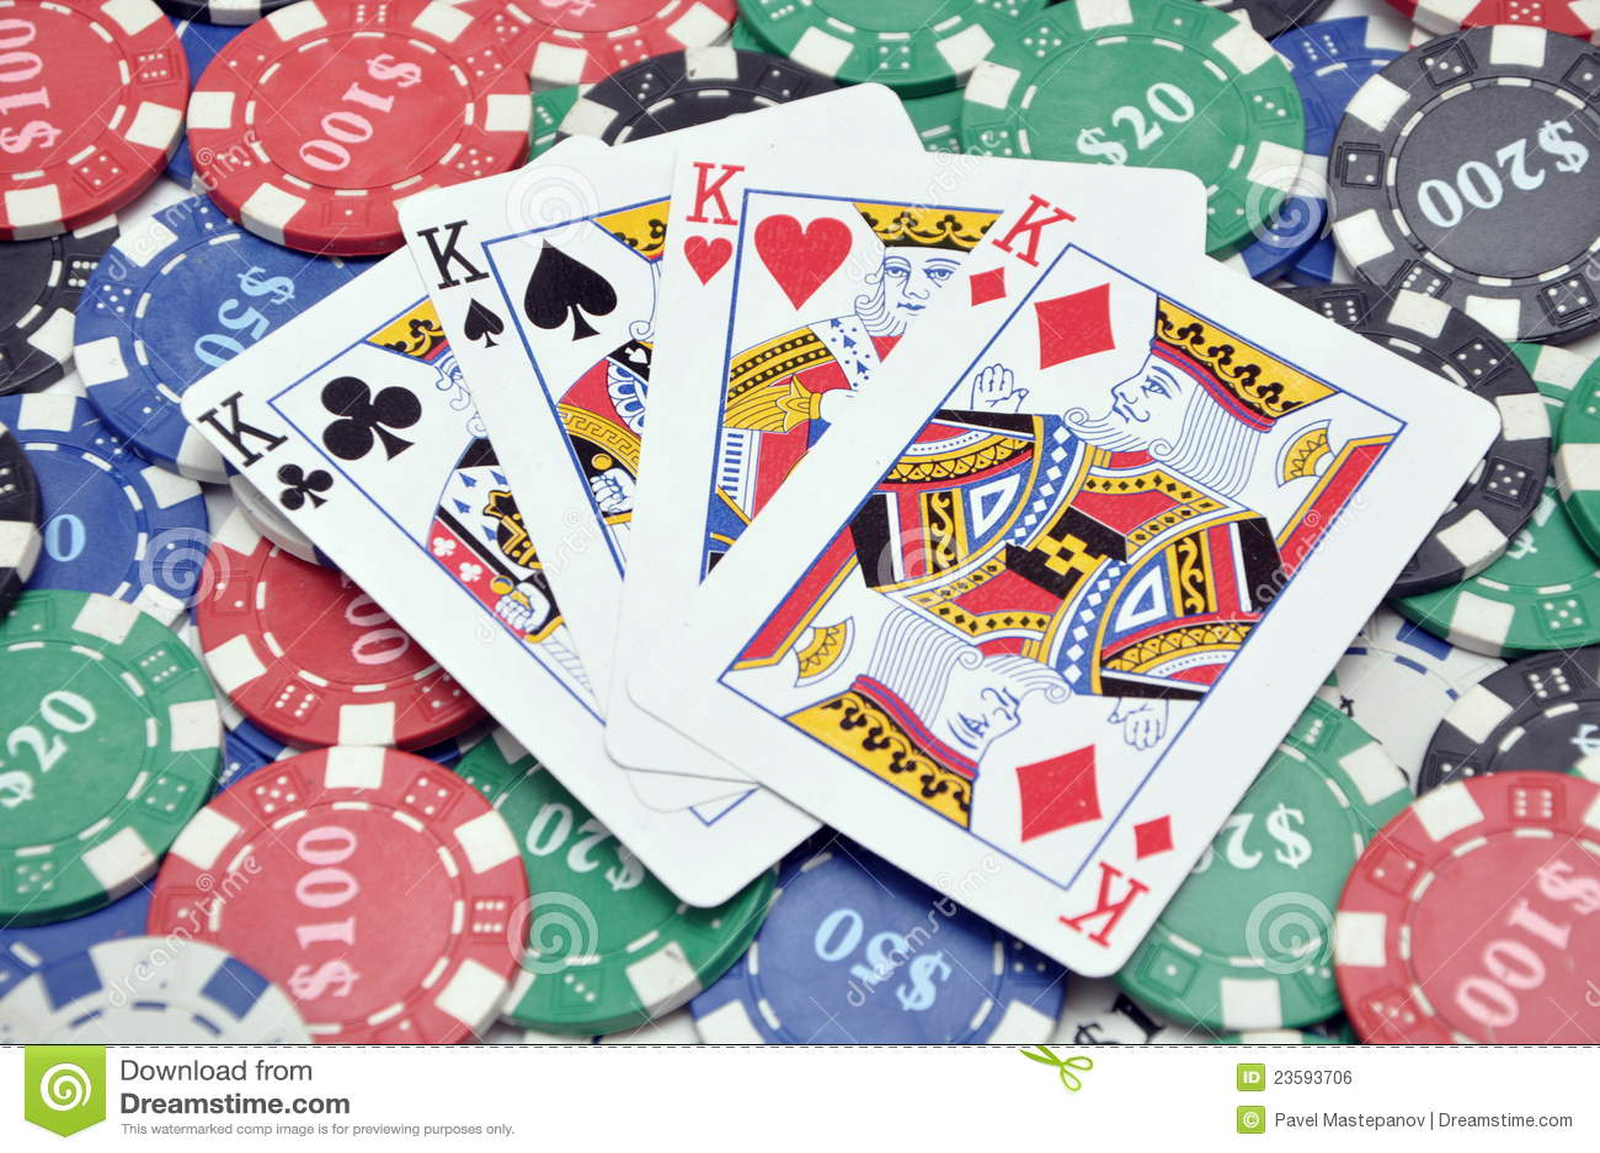 4 kings poker